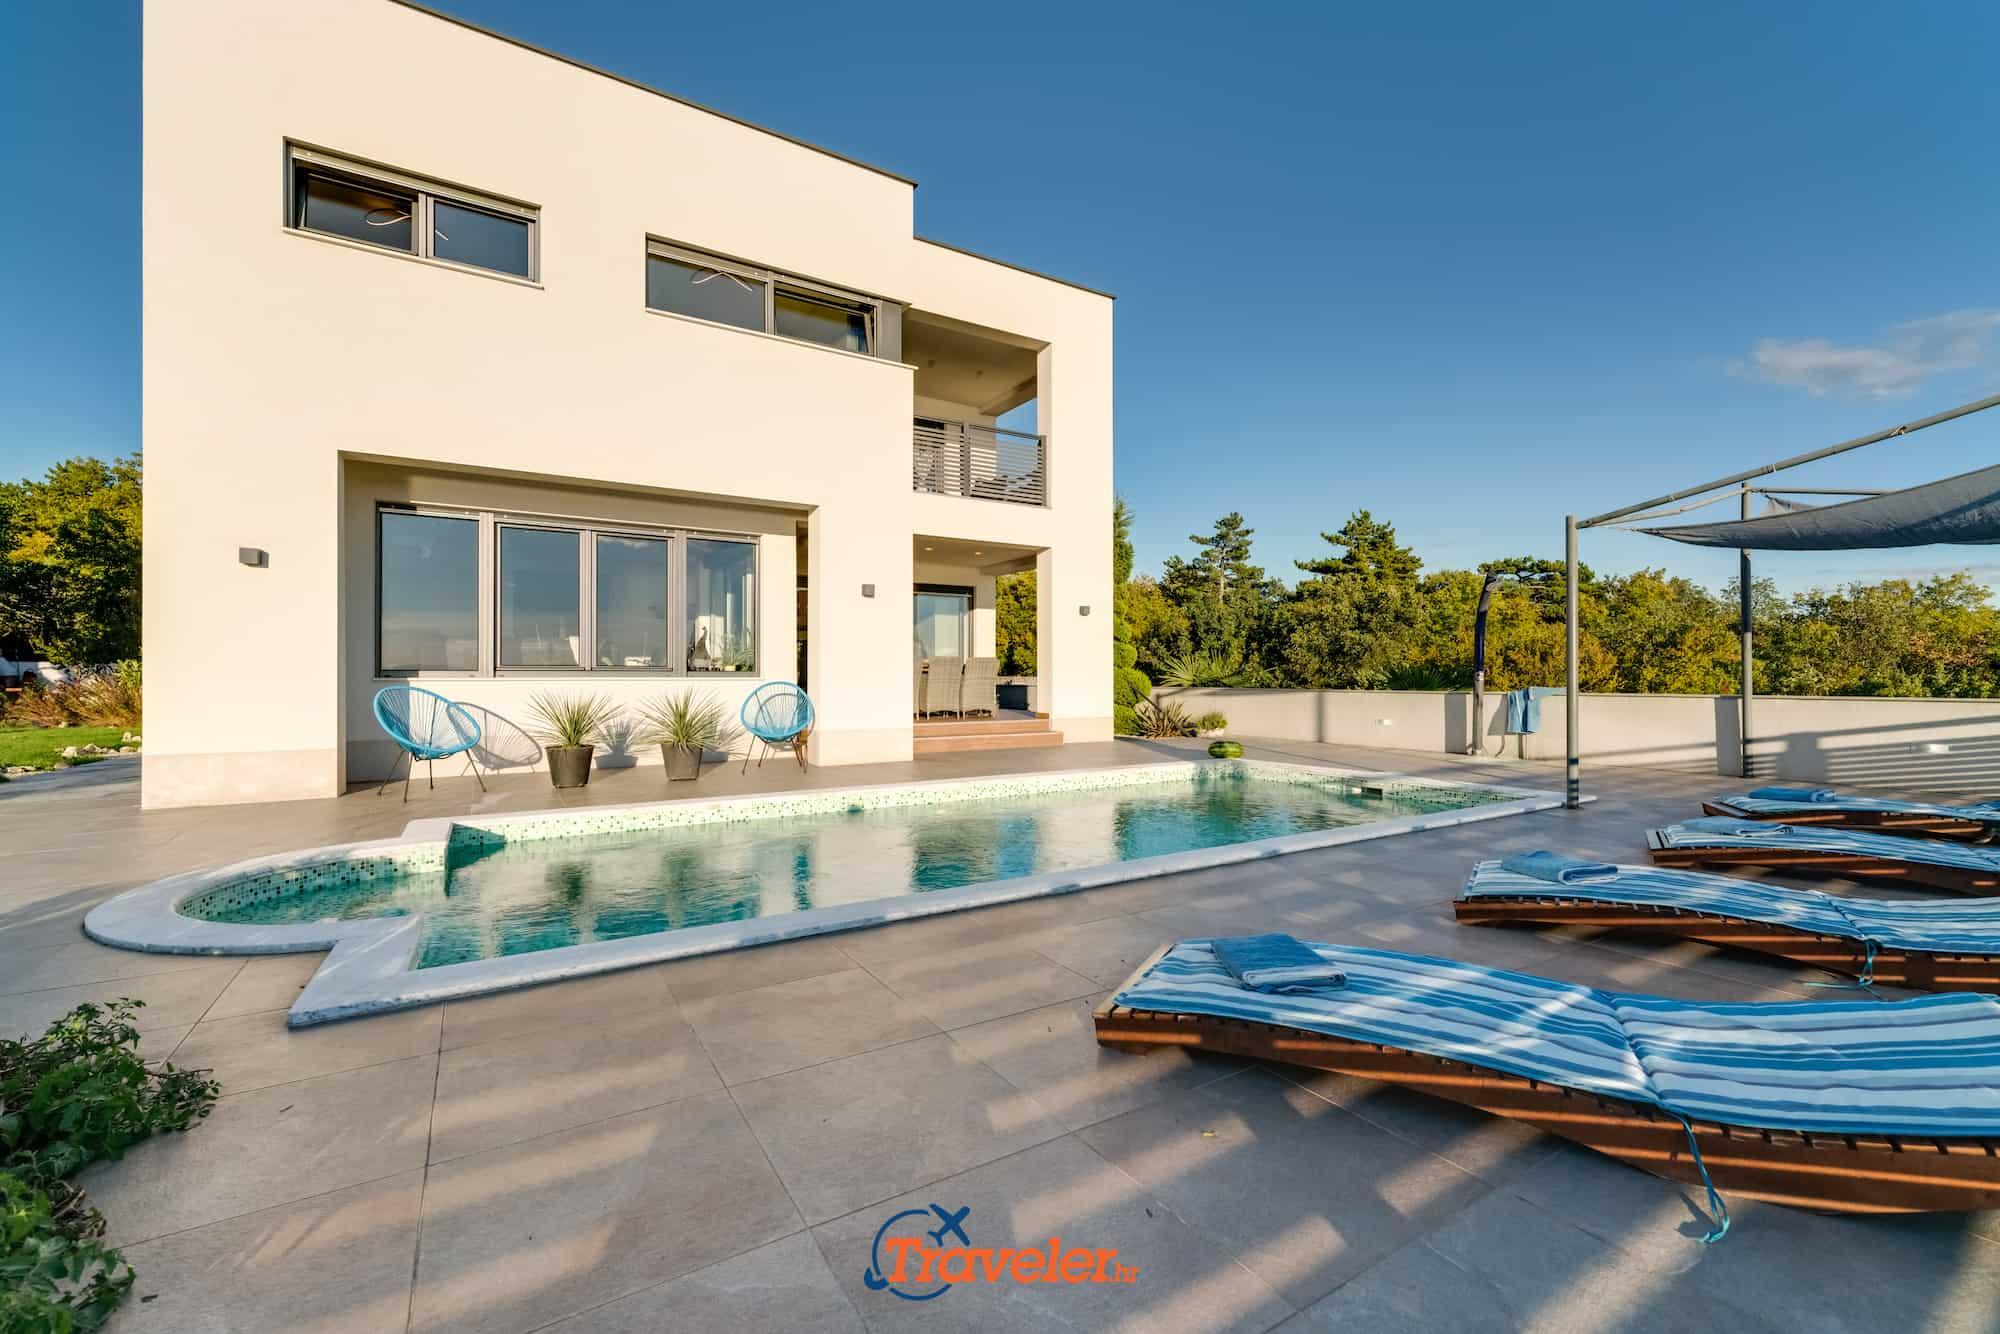 Villa mit Pool in Strandnähe, grandiosem Meerblick